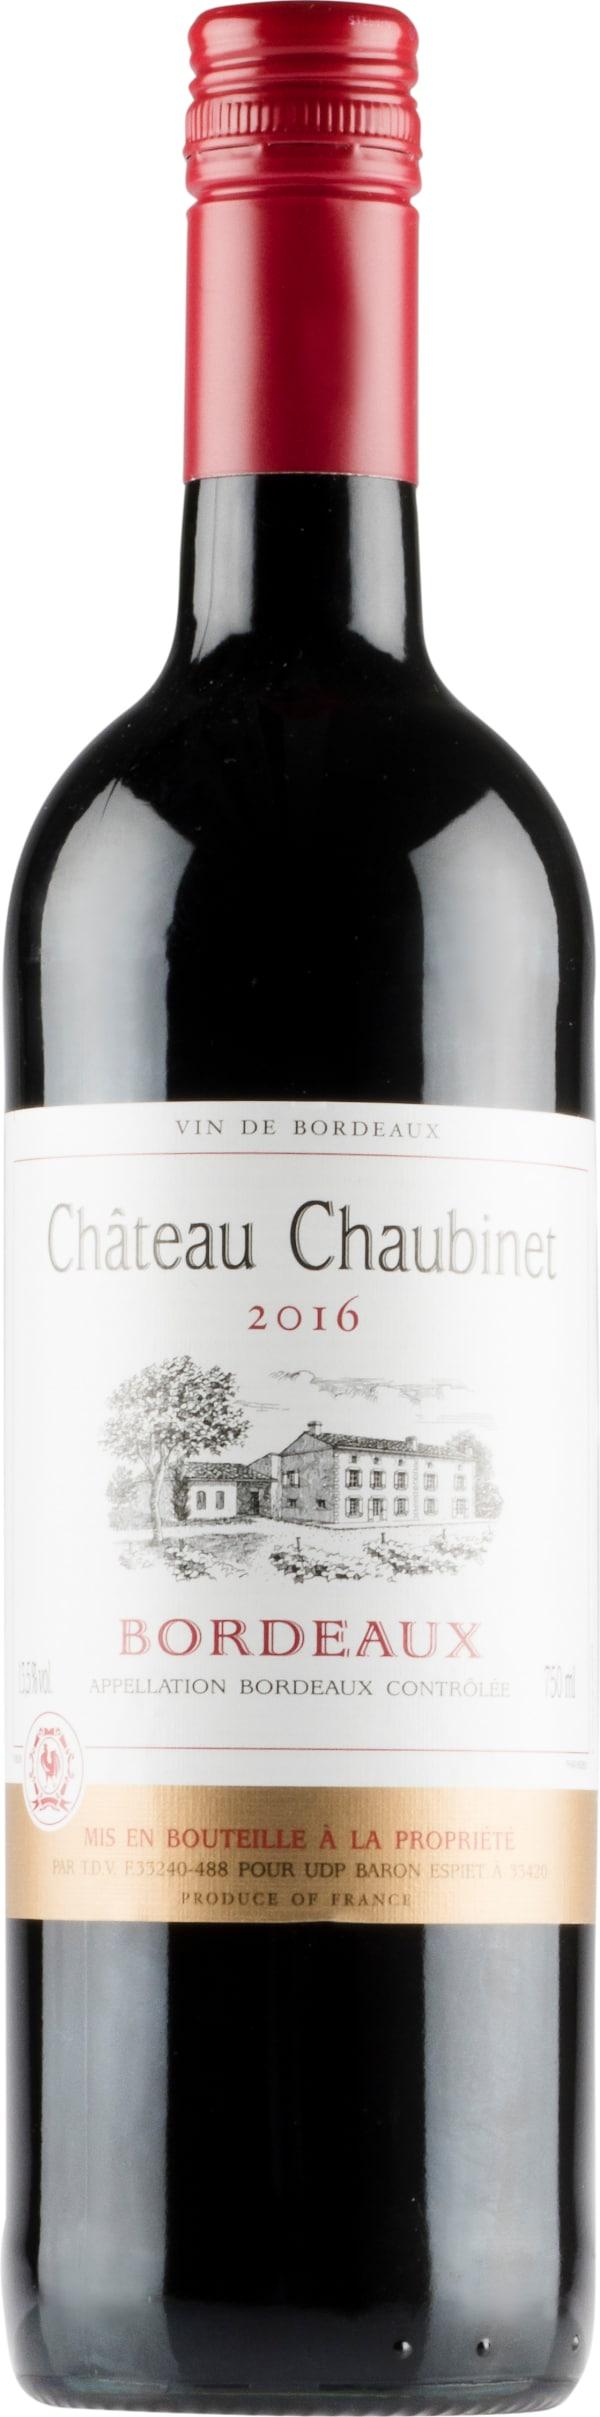 Château Chaubinet 2018